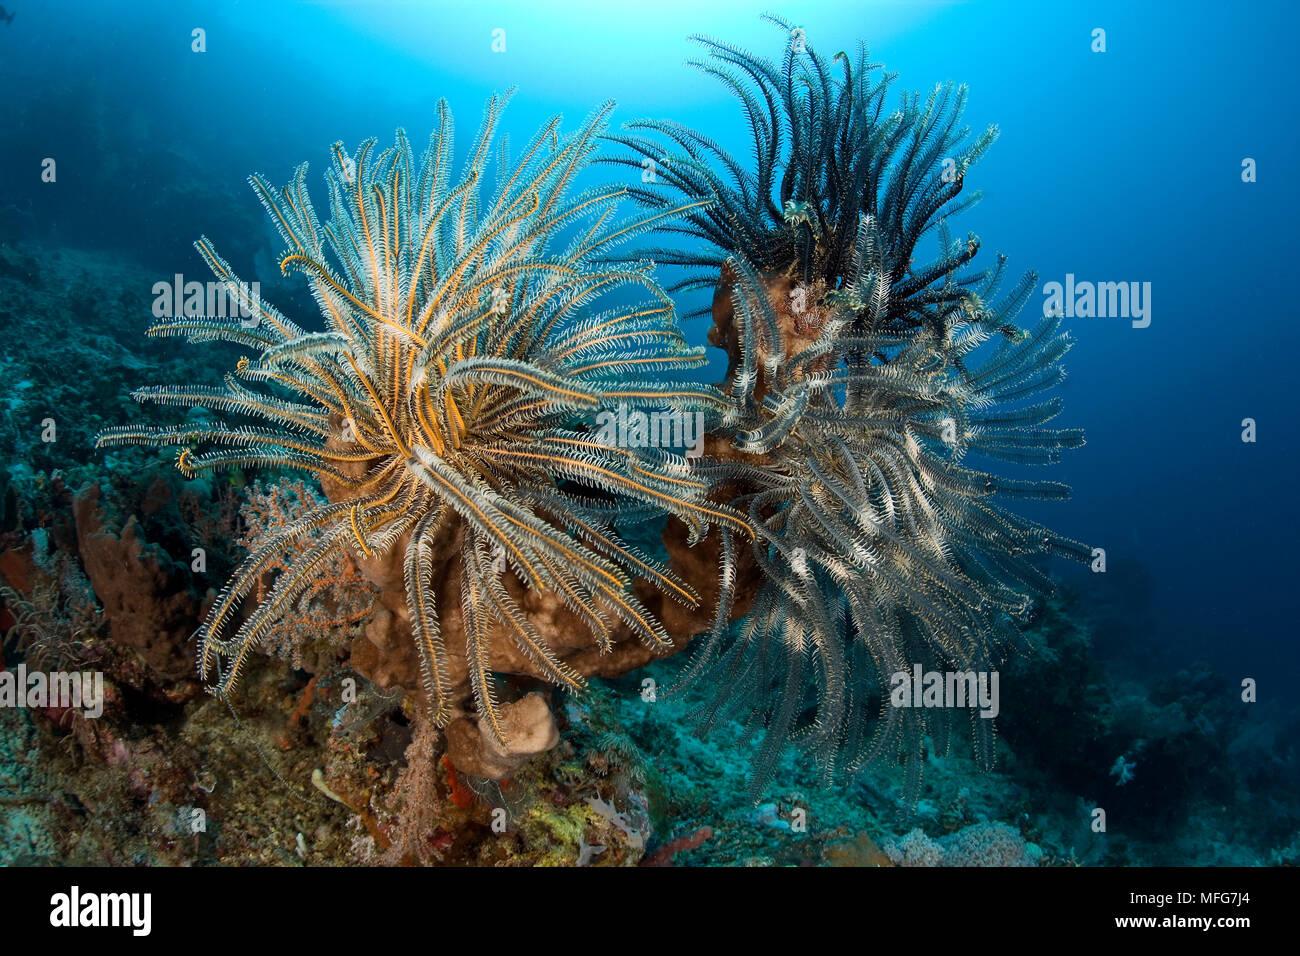 Crinoids, Oxycomanthus bennetti, Garden Eels dive site, Menjangan Island, Bali Island, Indonesia, Pacific Ocean  Date: 22.07.08  Ref: ZB777_117071_005 - Stock Image